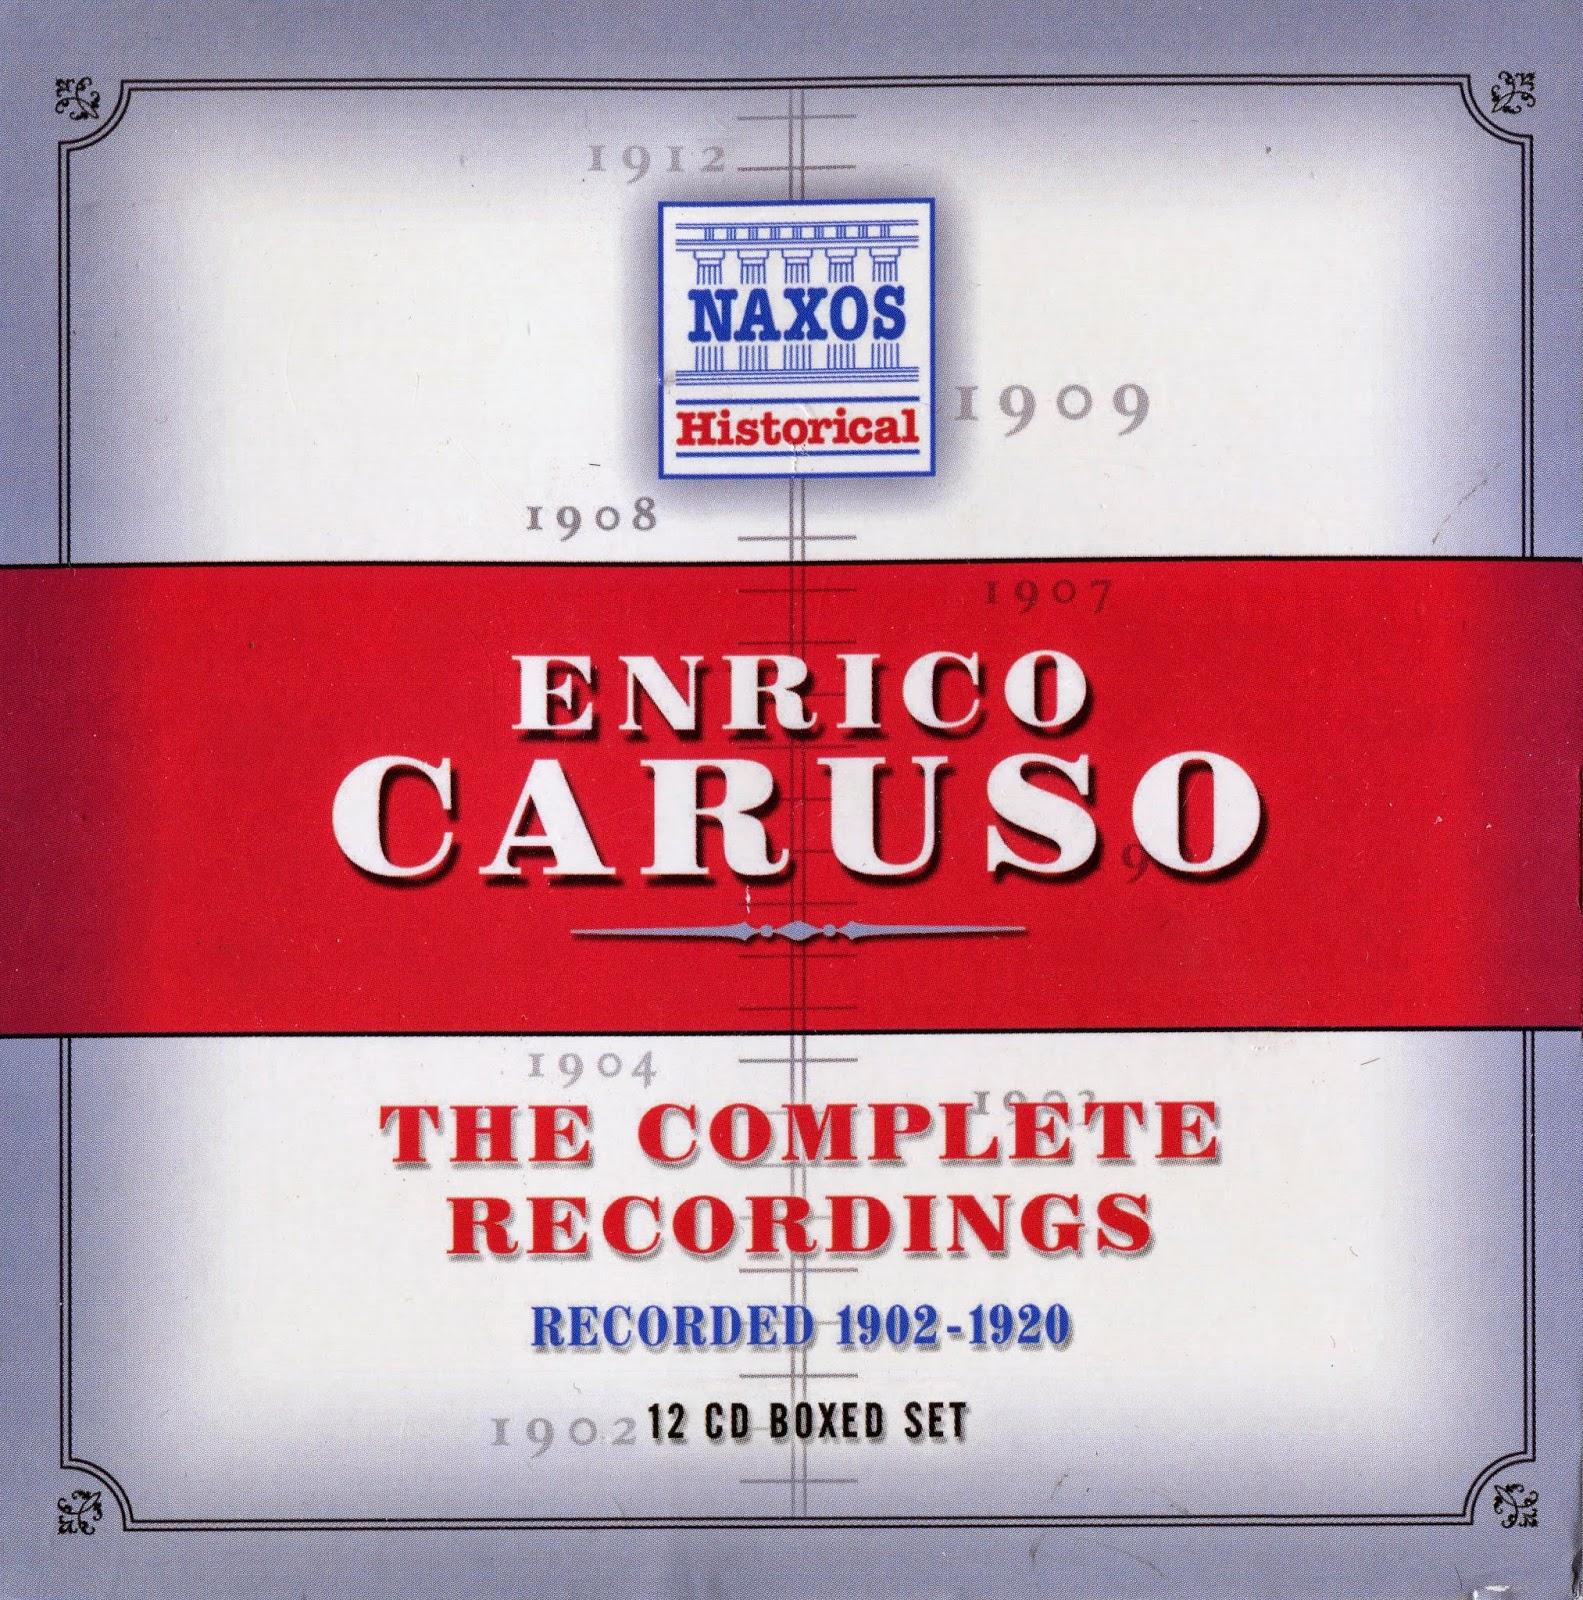 MIJAS: ENRICO CARUSO - The Complete Recordings Naxos Historical